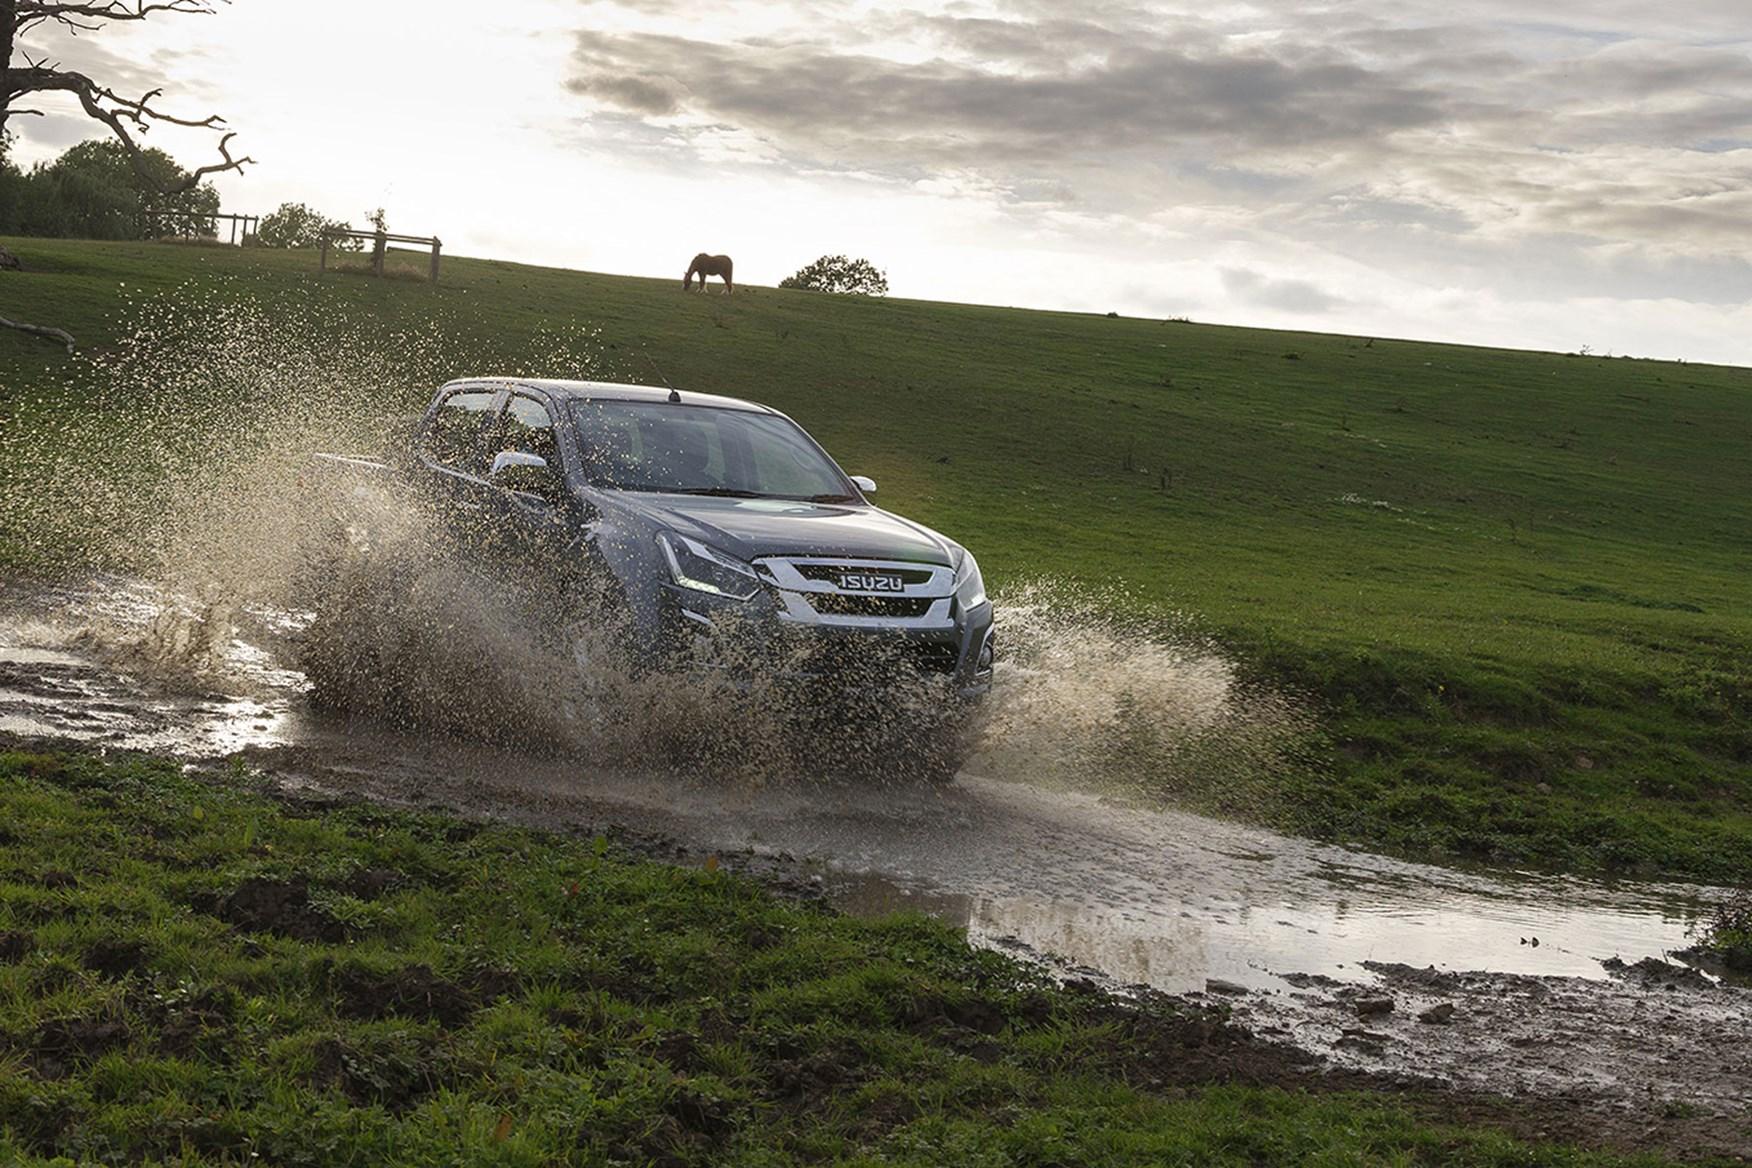 Isuzu D-Max Yukon review - splashing through water in field, grey